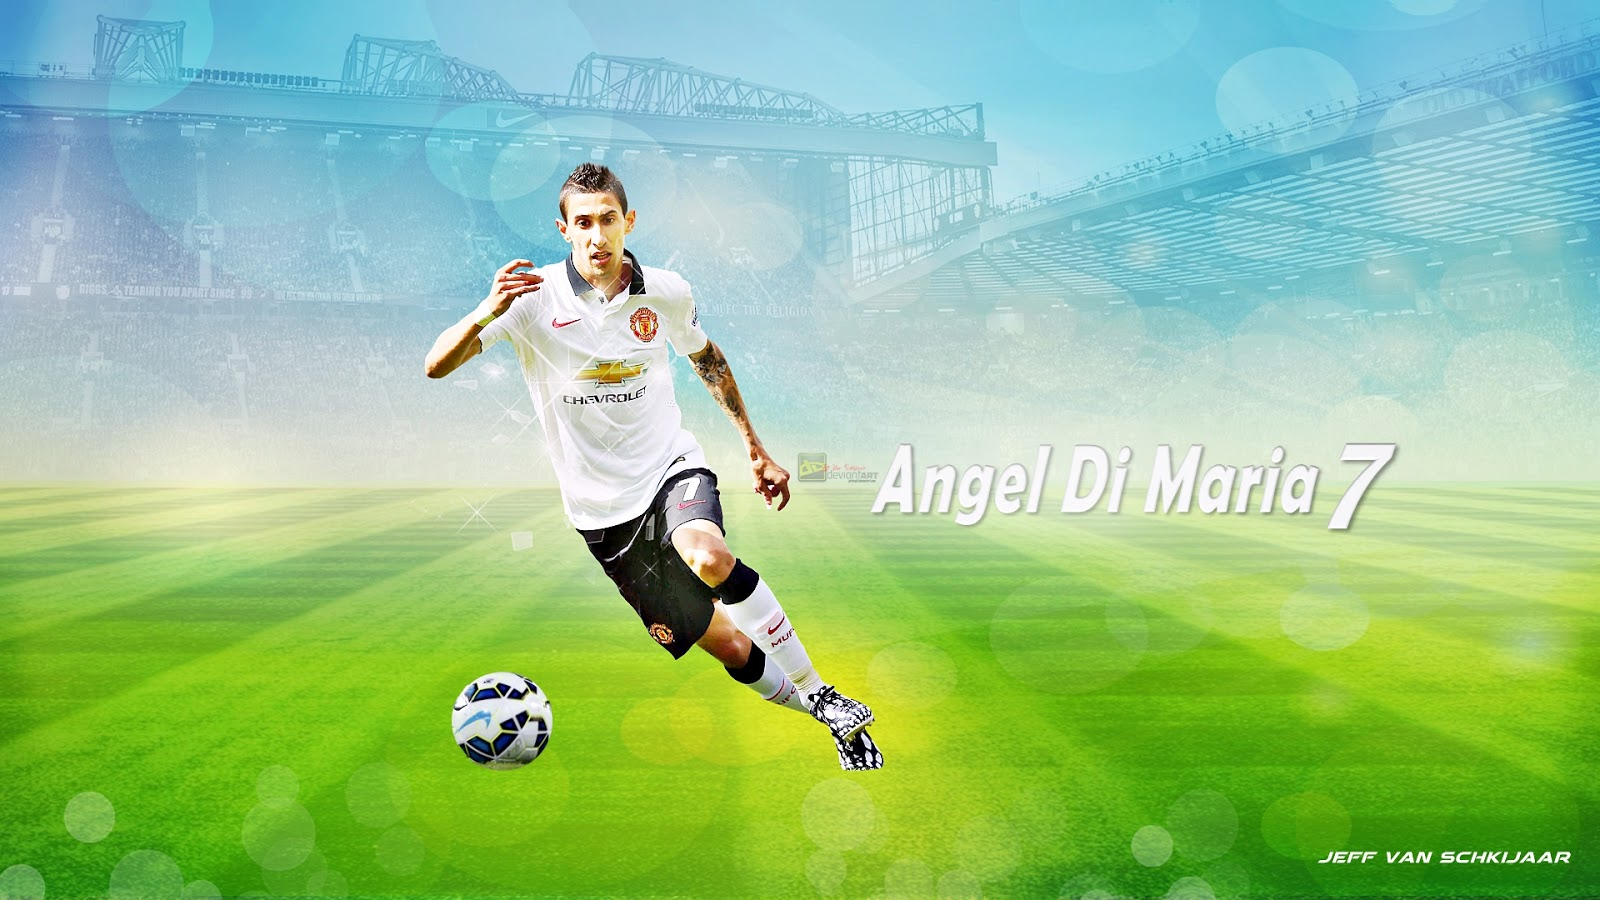 Angel Di Maria High Resolution